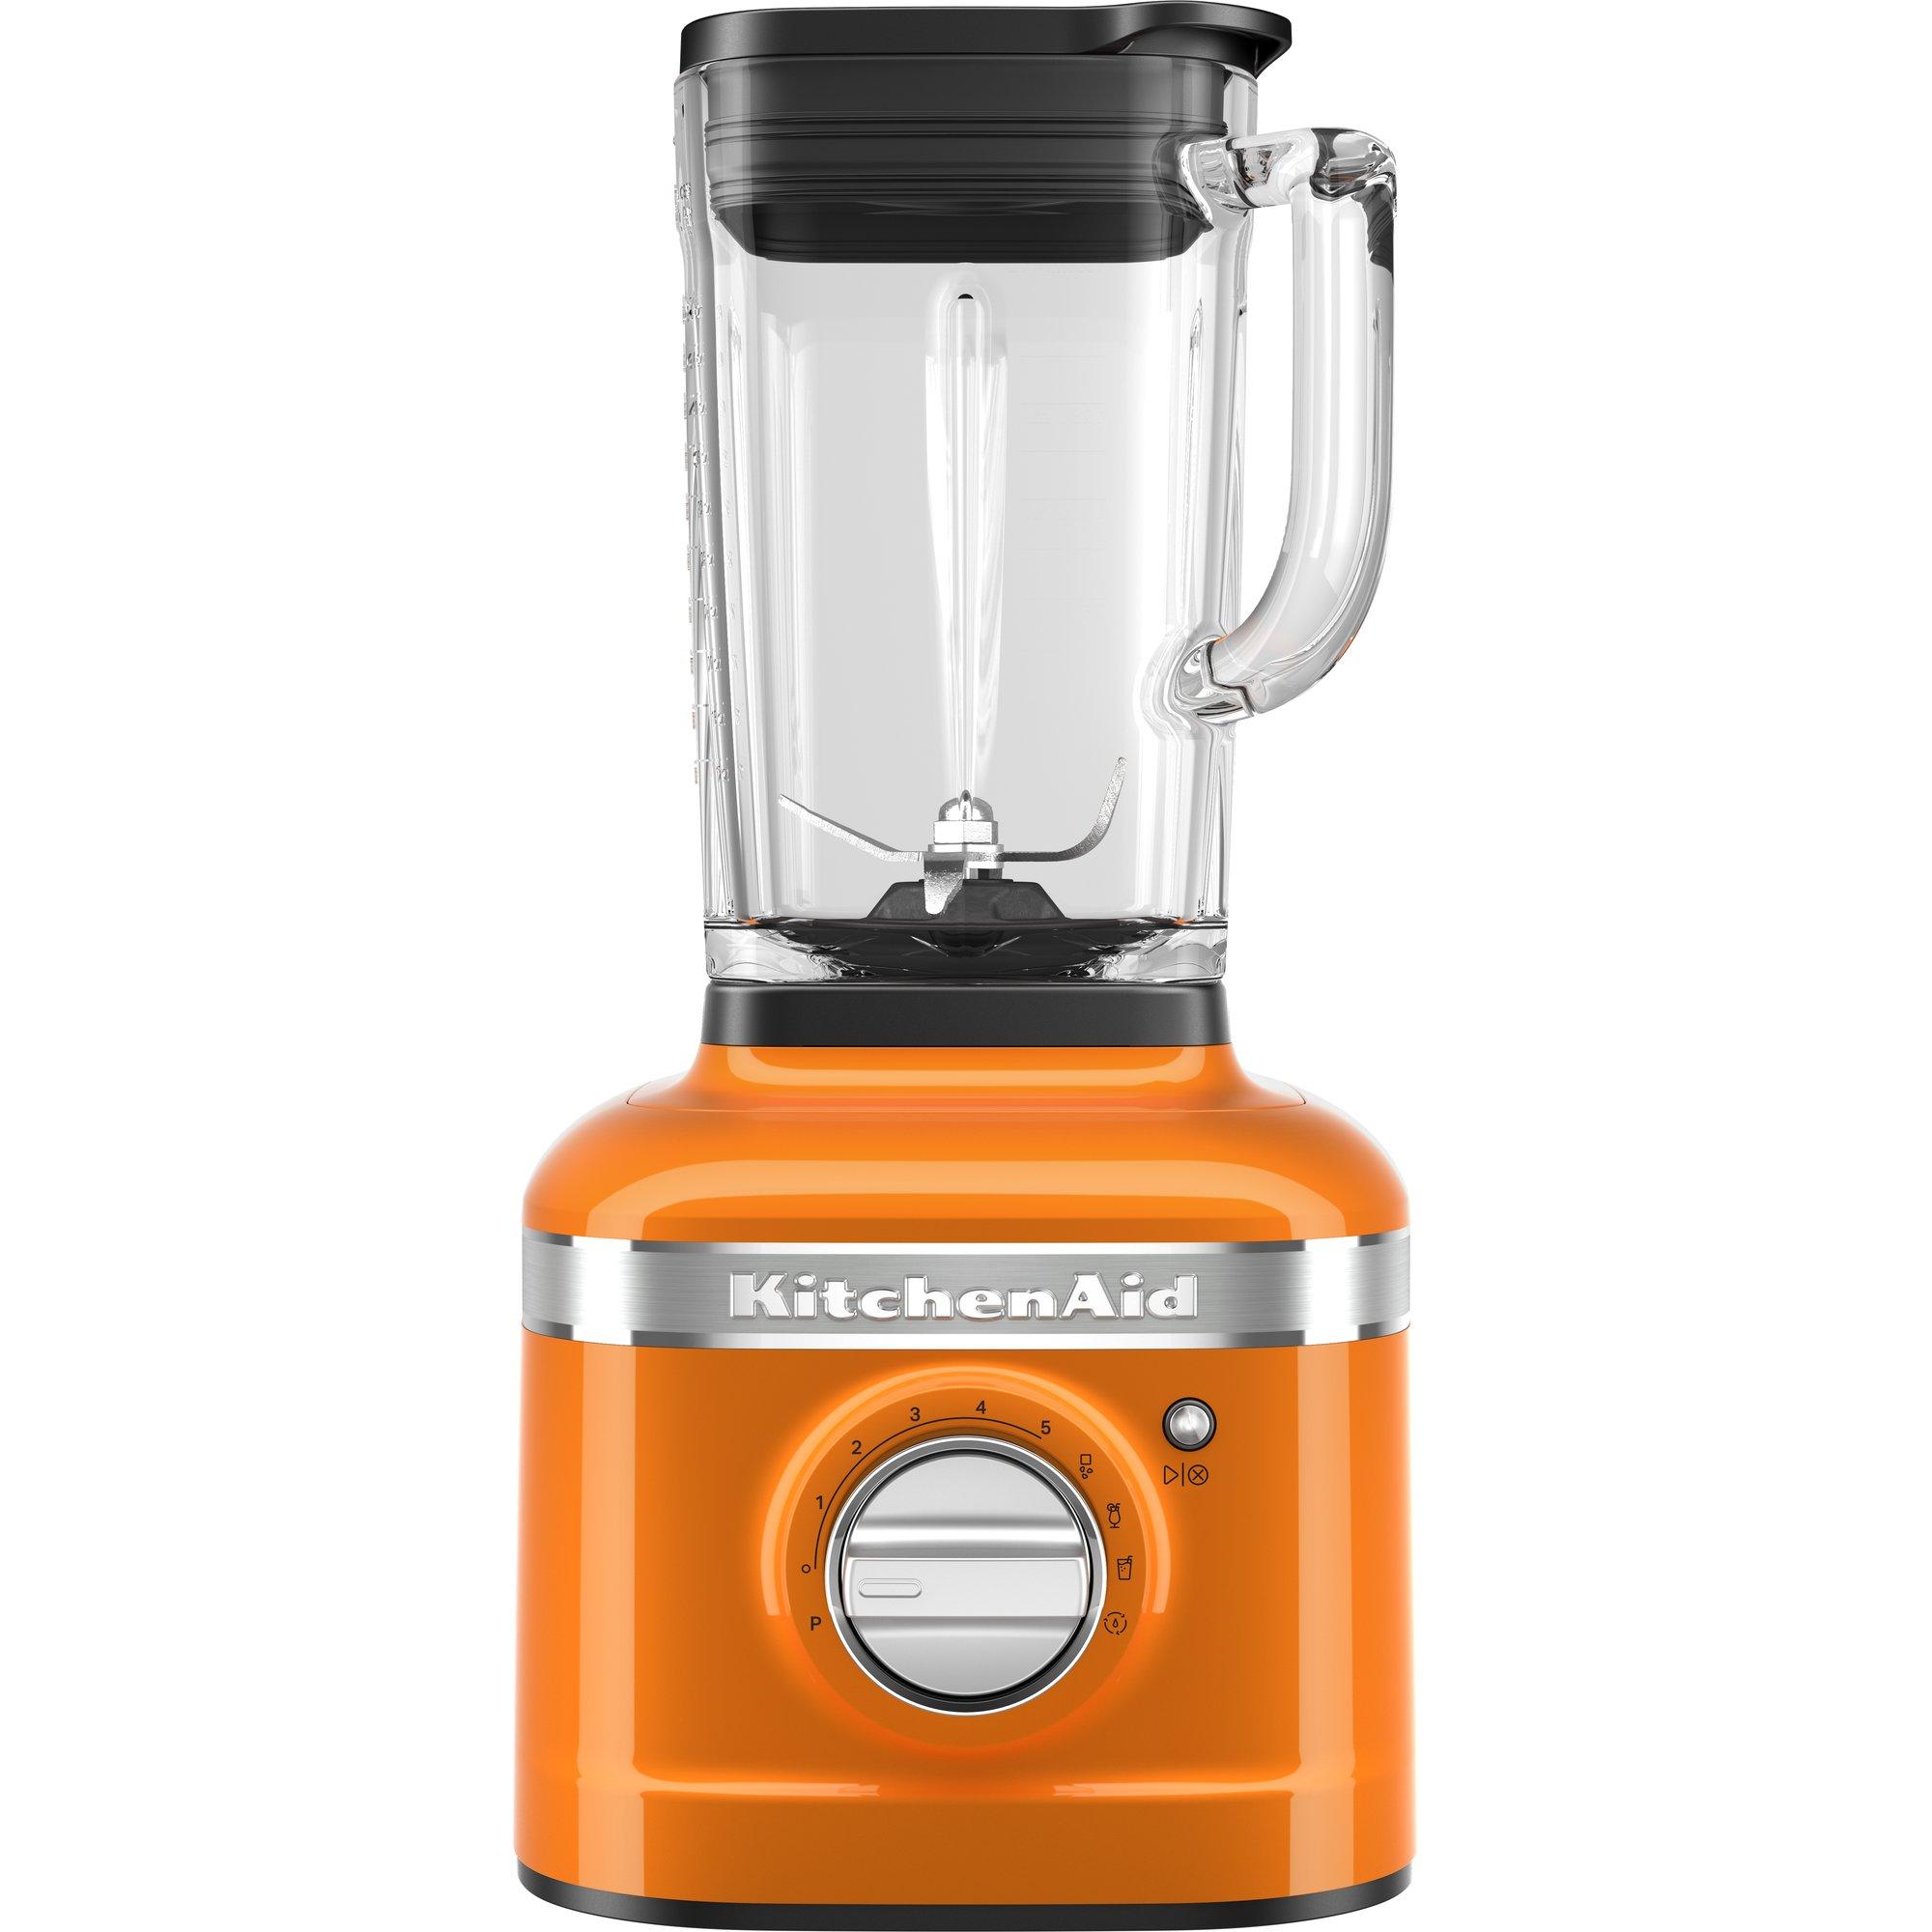 KitchenAid Artisan K400 Blender Honey